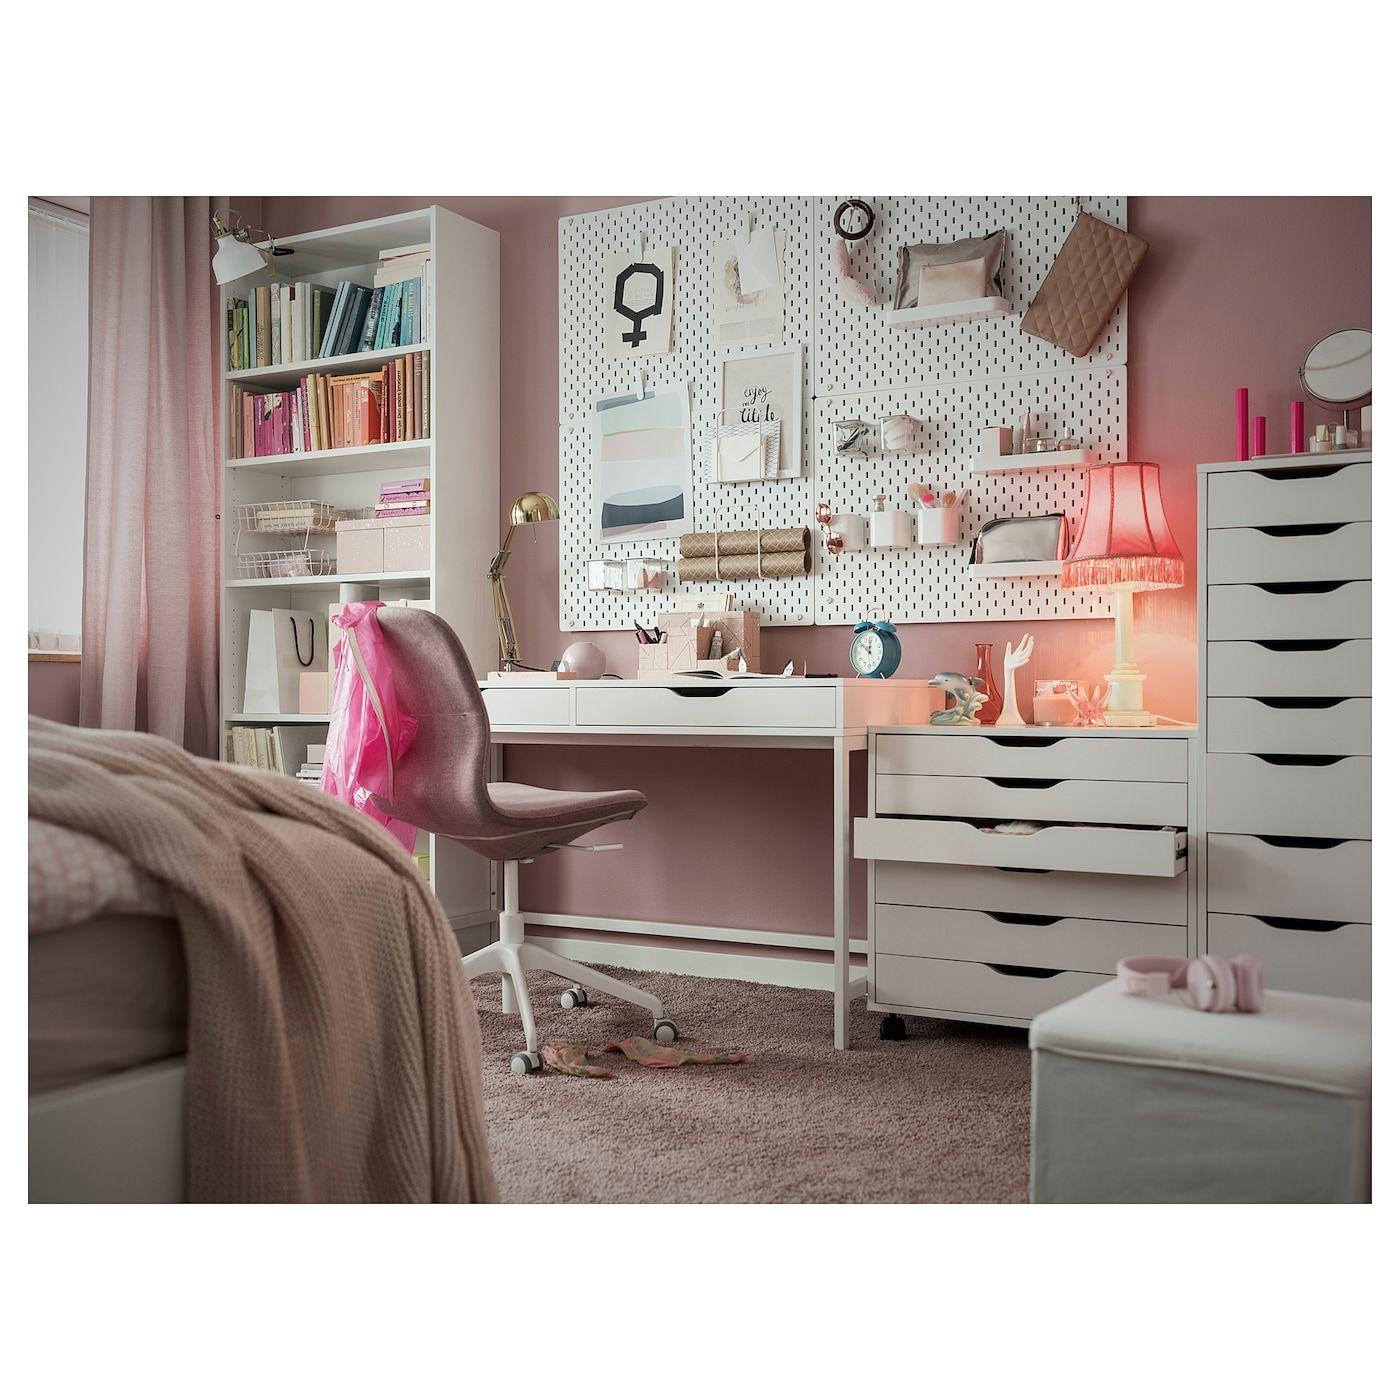 Alex Desk White Ikea In 2020 Alex Desk White Desks Drawer Unit